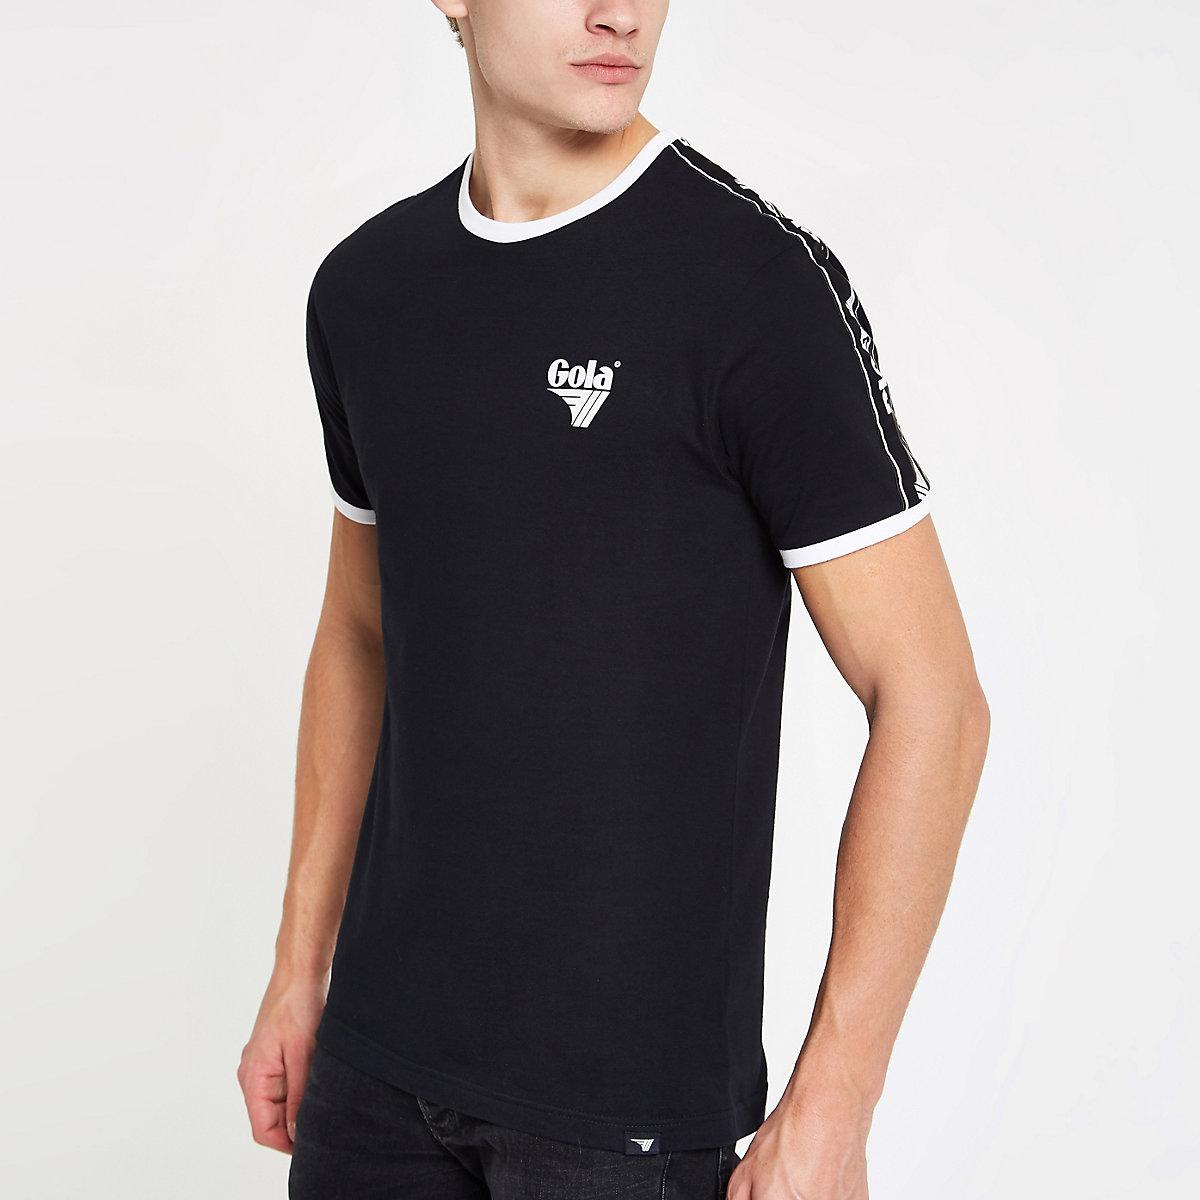 Gola black tipped crew neck T-shirt